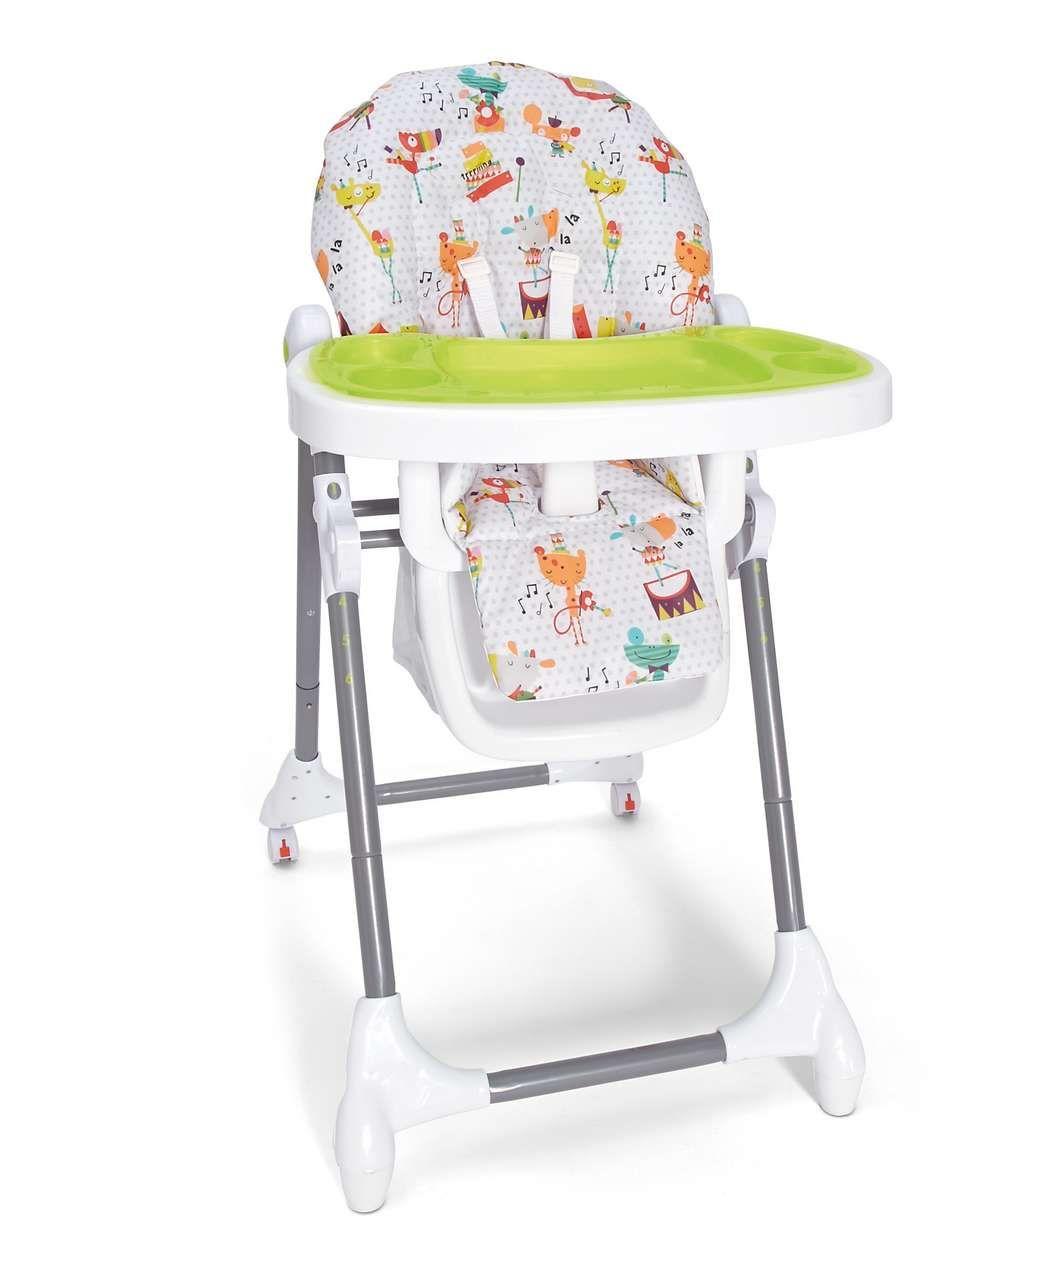 Astounding Pin Di Cincirinella Su Baby Stuff Onthecornerstone Fun Painted Chair Ideas Images Onthecornerstoneorg